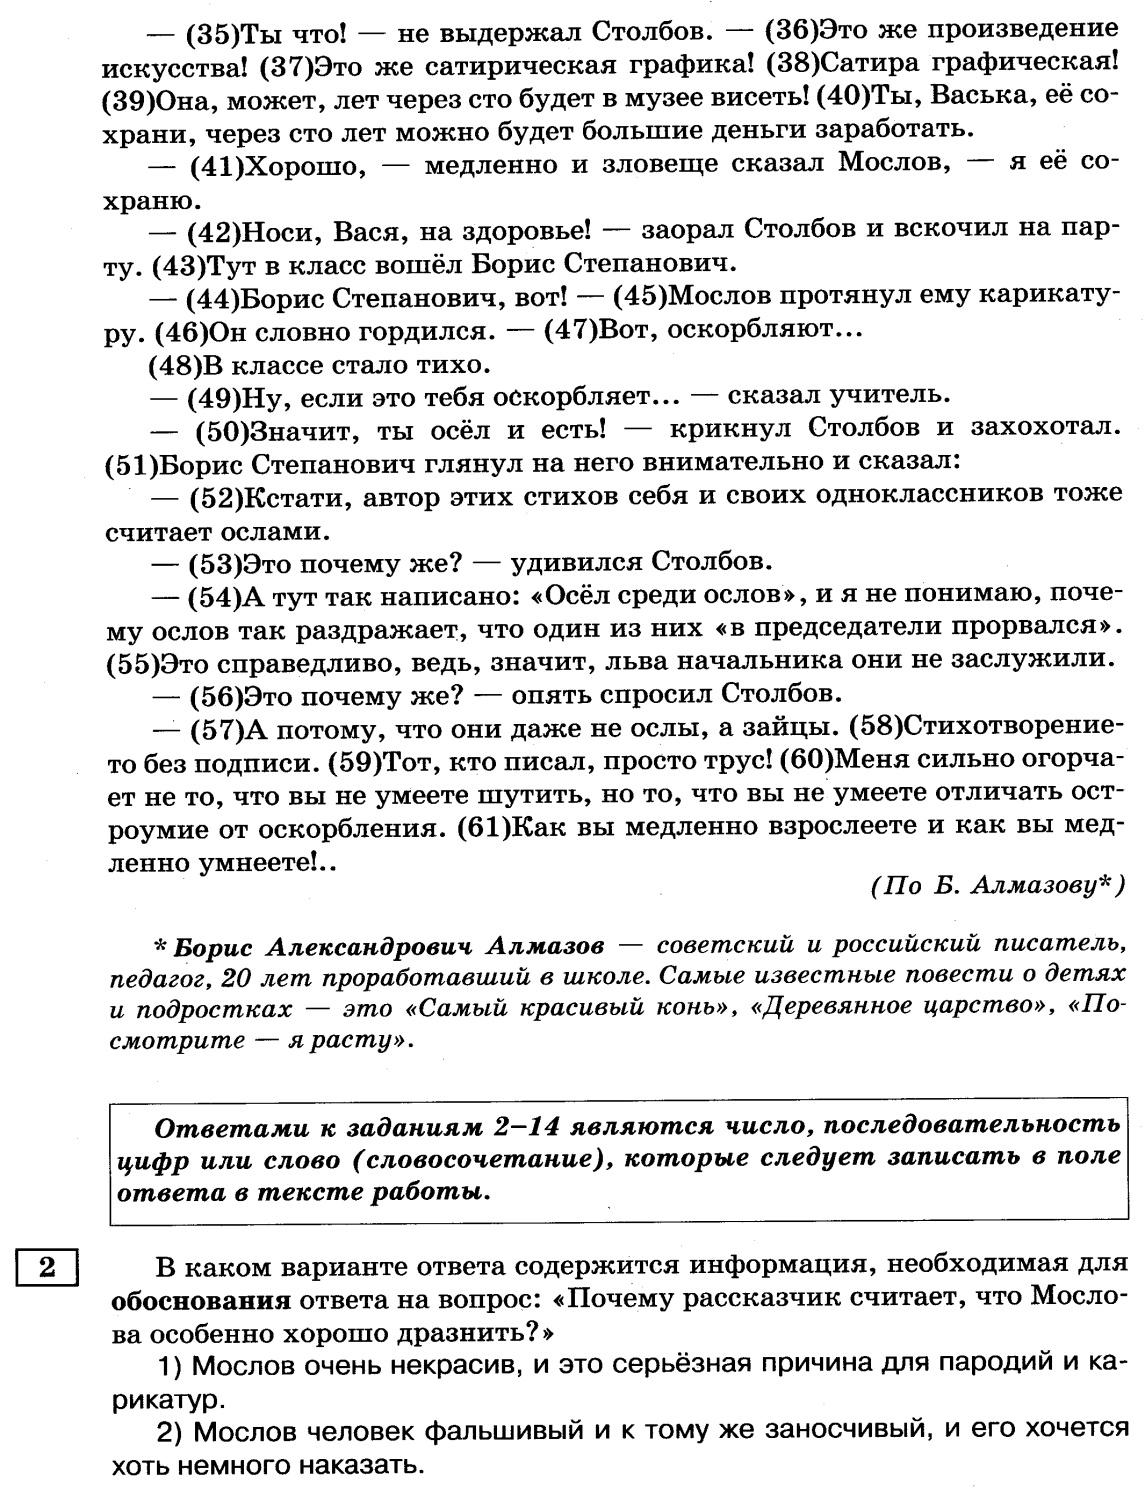 C:\Documents and Settings\Наташа\Рабочий стол\ОГЭ 2016\КИМы Степановой ОГЭ-2016\img295.jpg